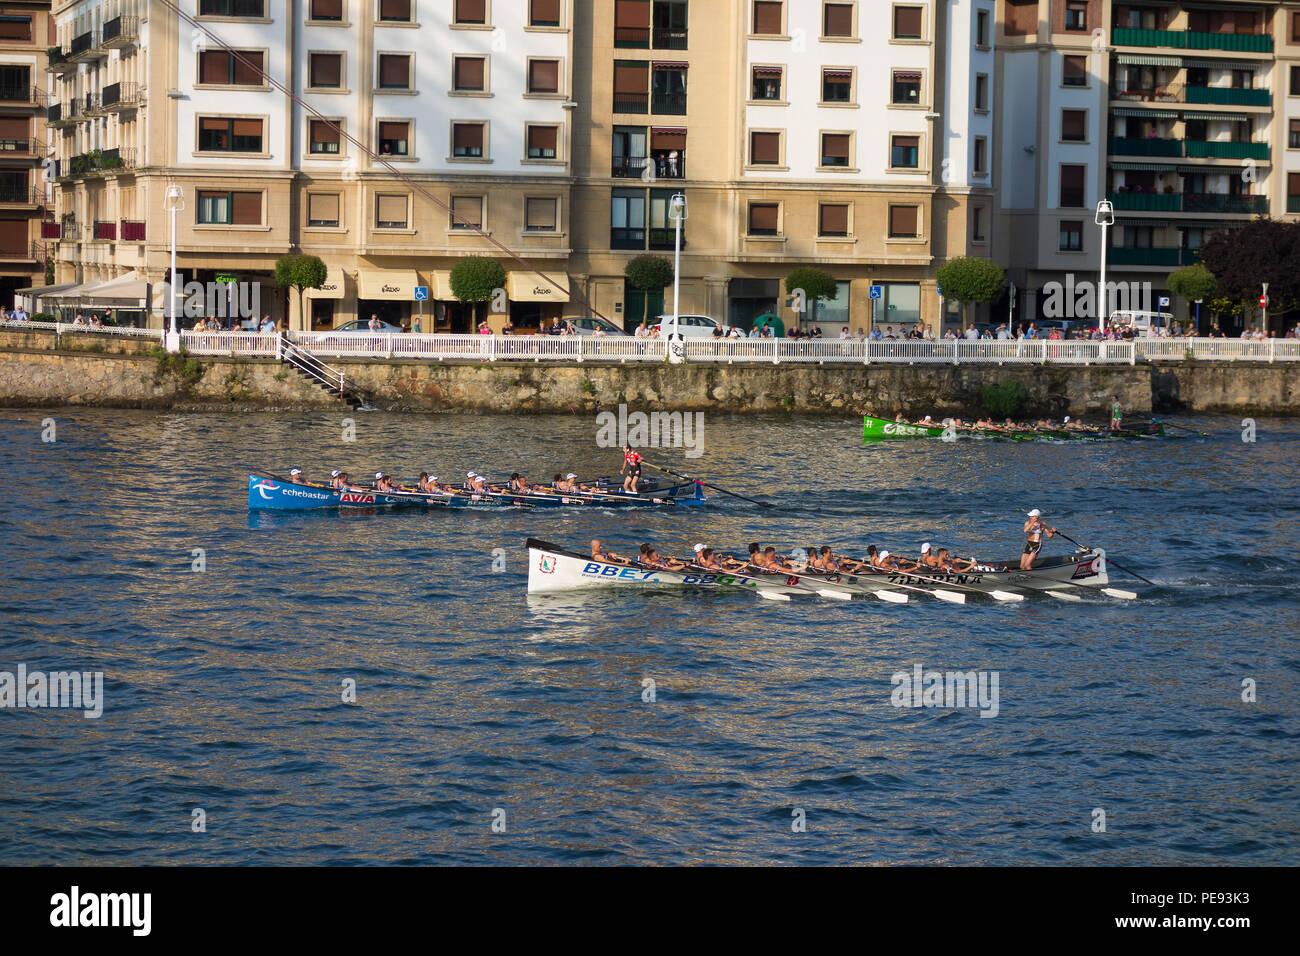 Rowing boat in Portugalete, Bizkaia, Spain - Stock Image